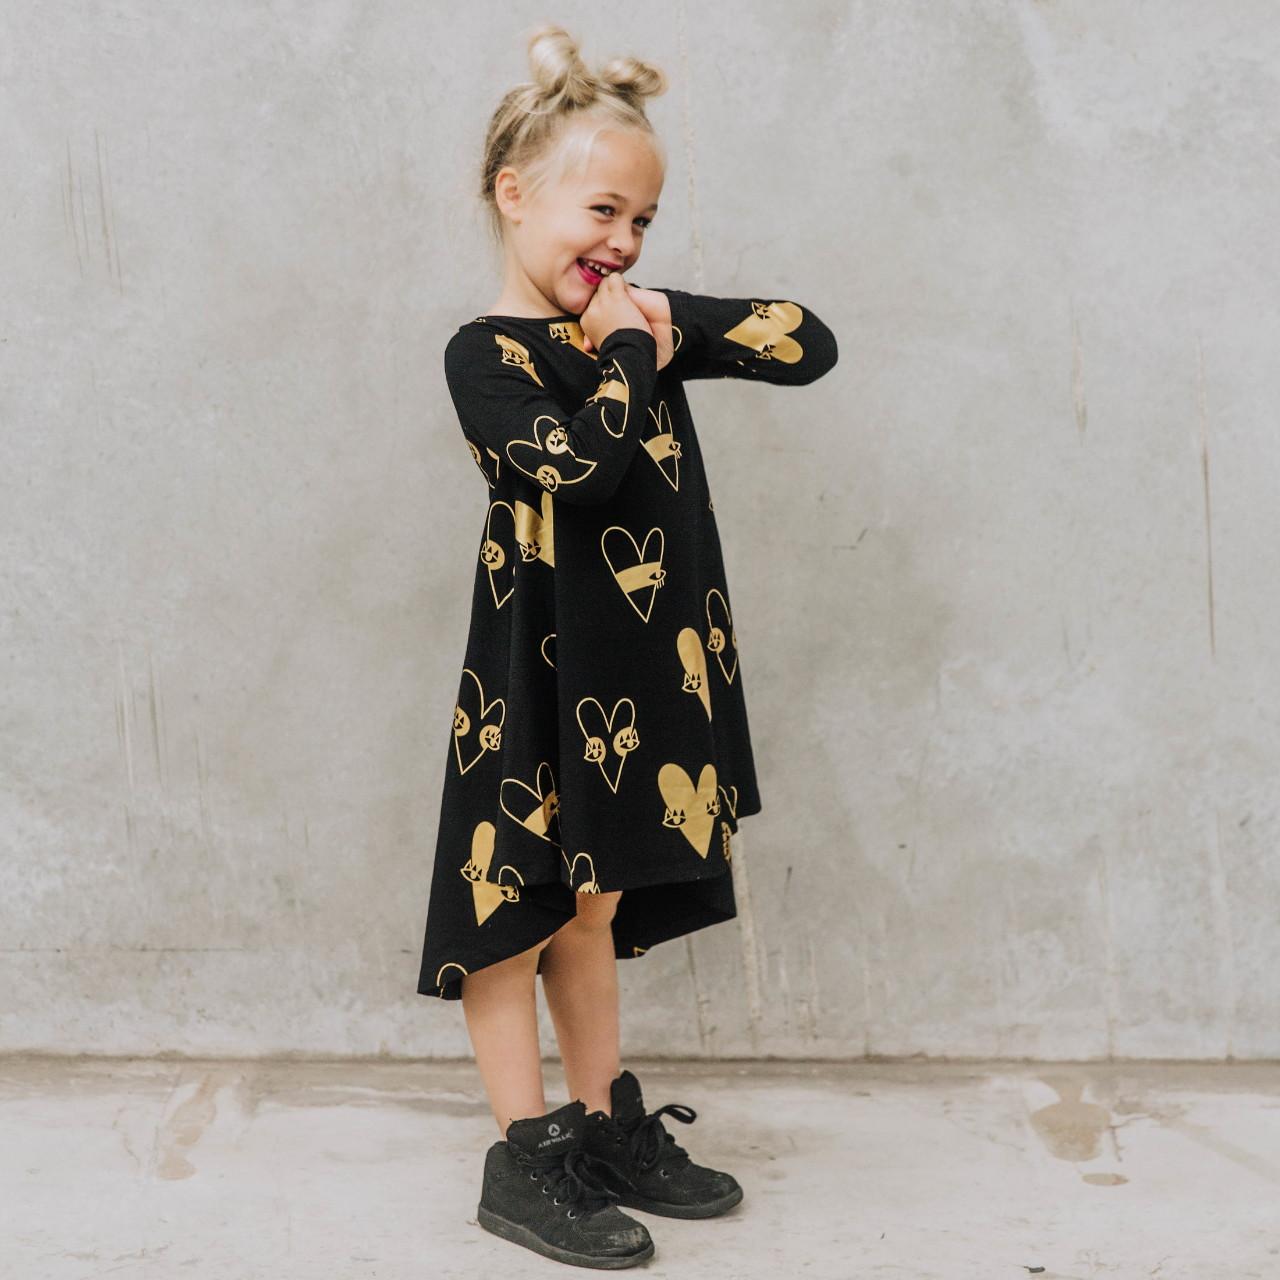 Gold skull dress by Punk Baby